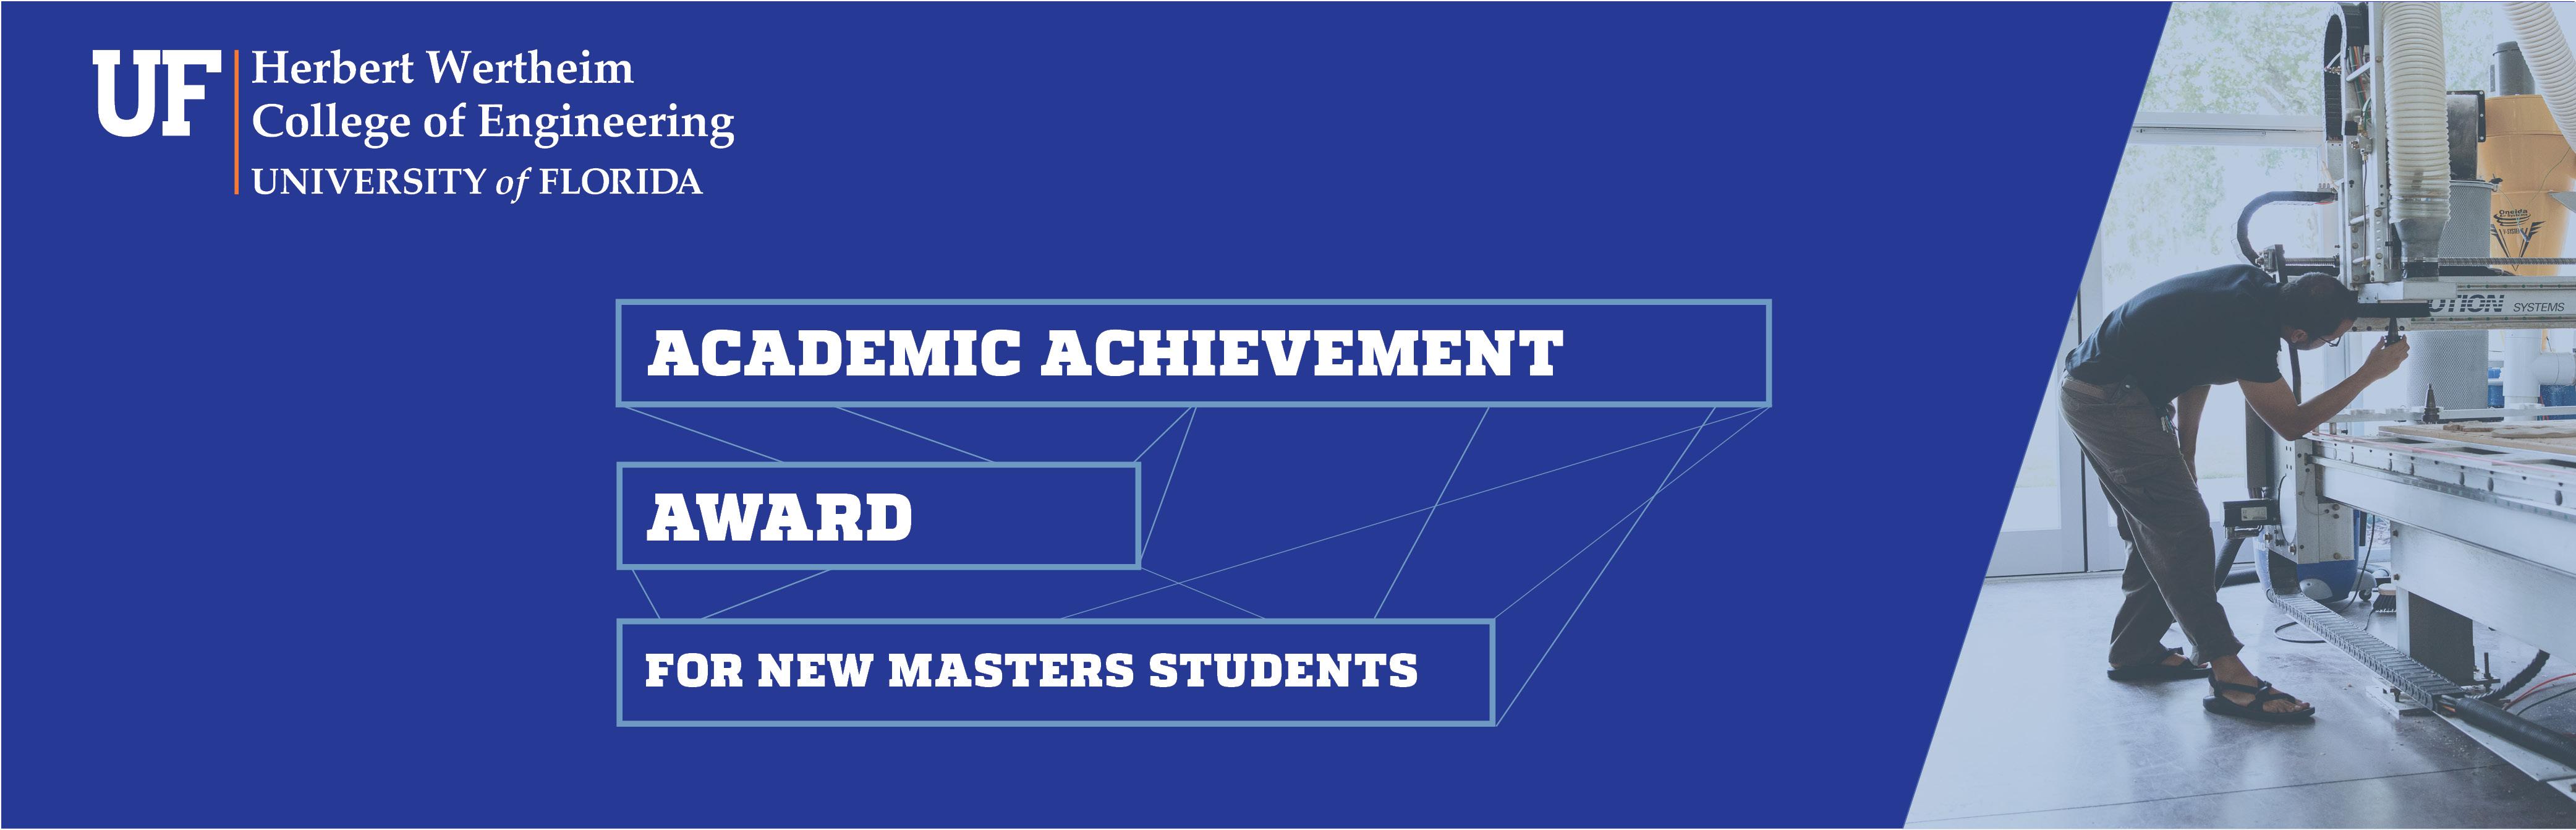 Uf 2023 To 2022 Calendar.Academic Achievement Award Graduate Student Affairs